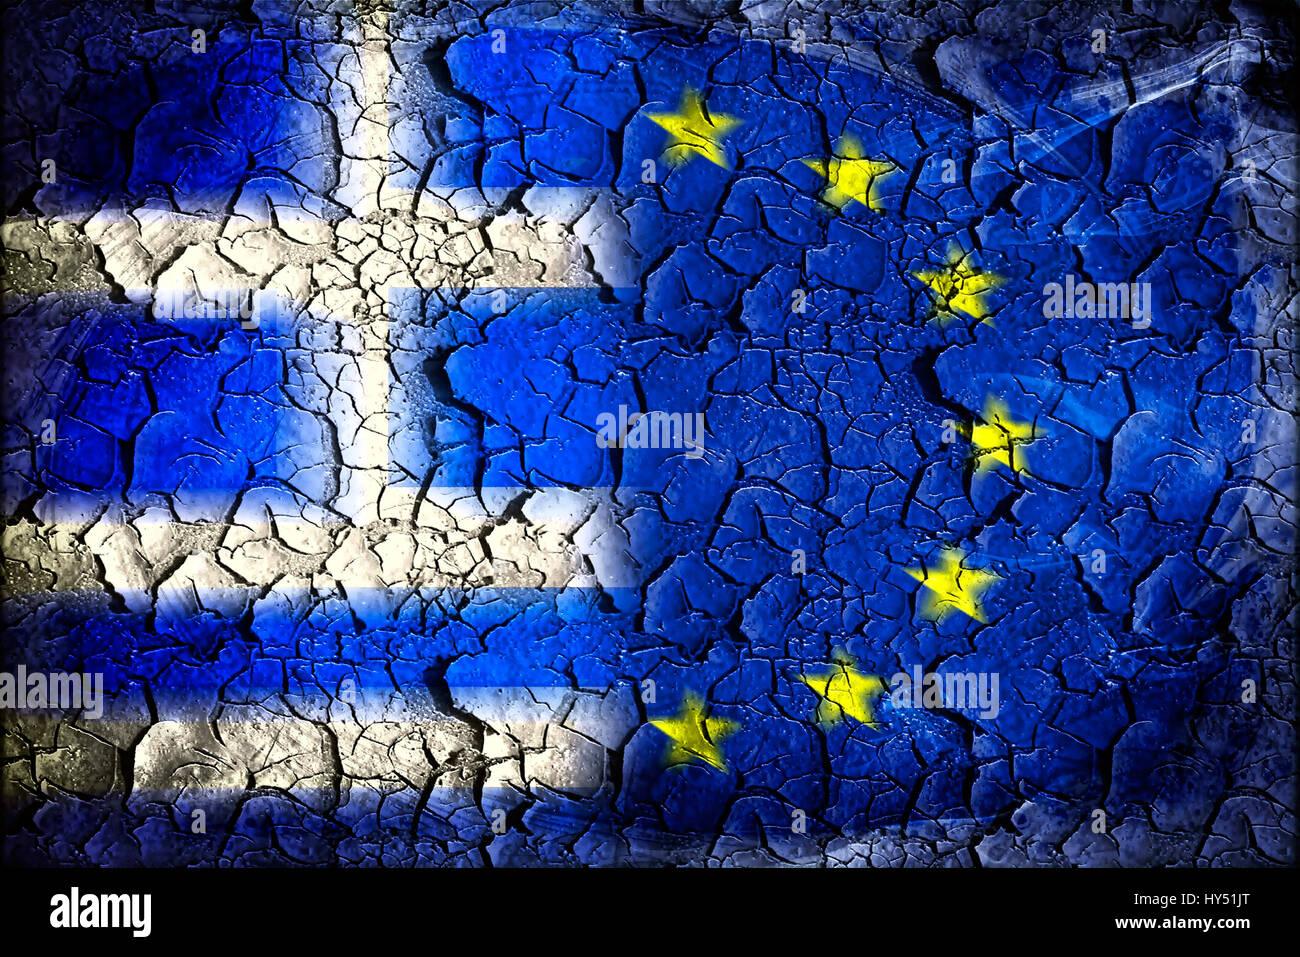 Greece and EU flag with tears, symbolic photo Grexit, Griechenland- und EU-Fahne mit Rissen, Symbolfoto Grexit Stock Photo